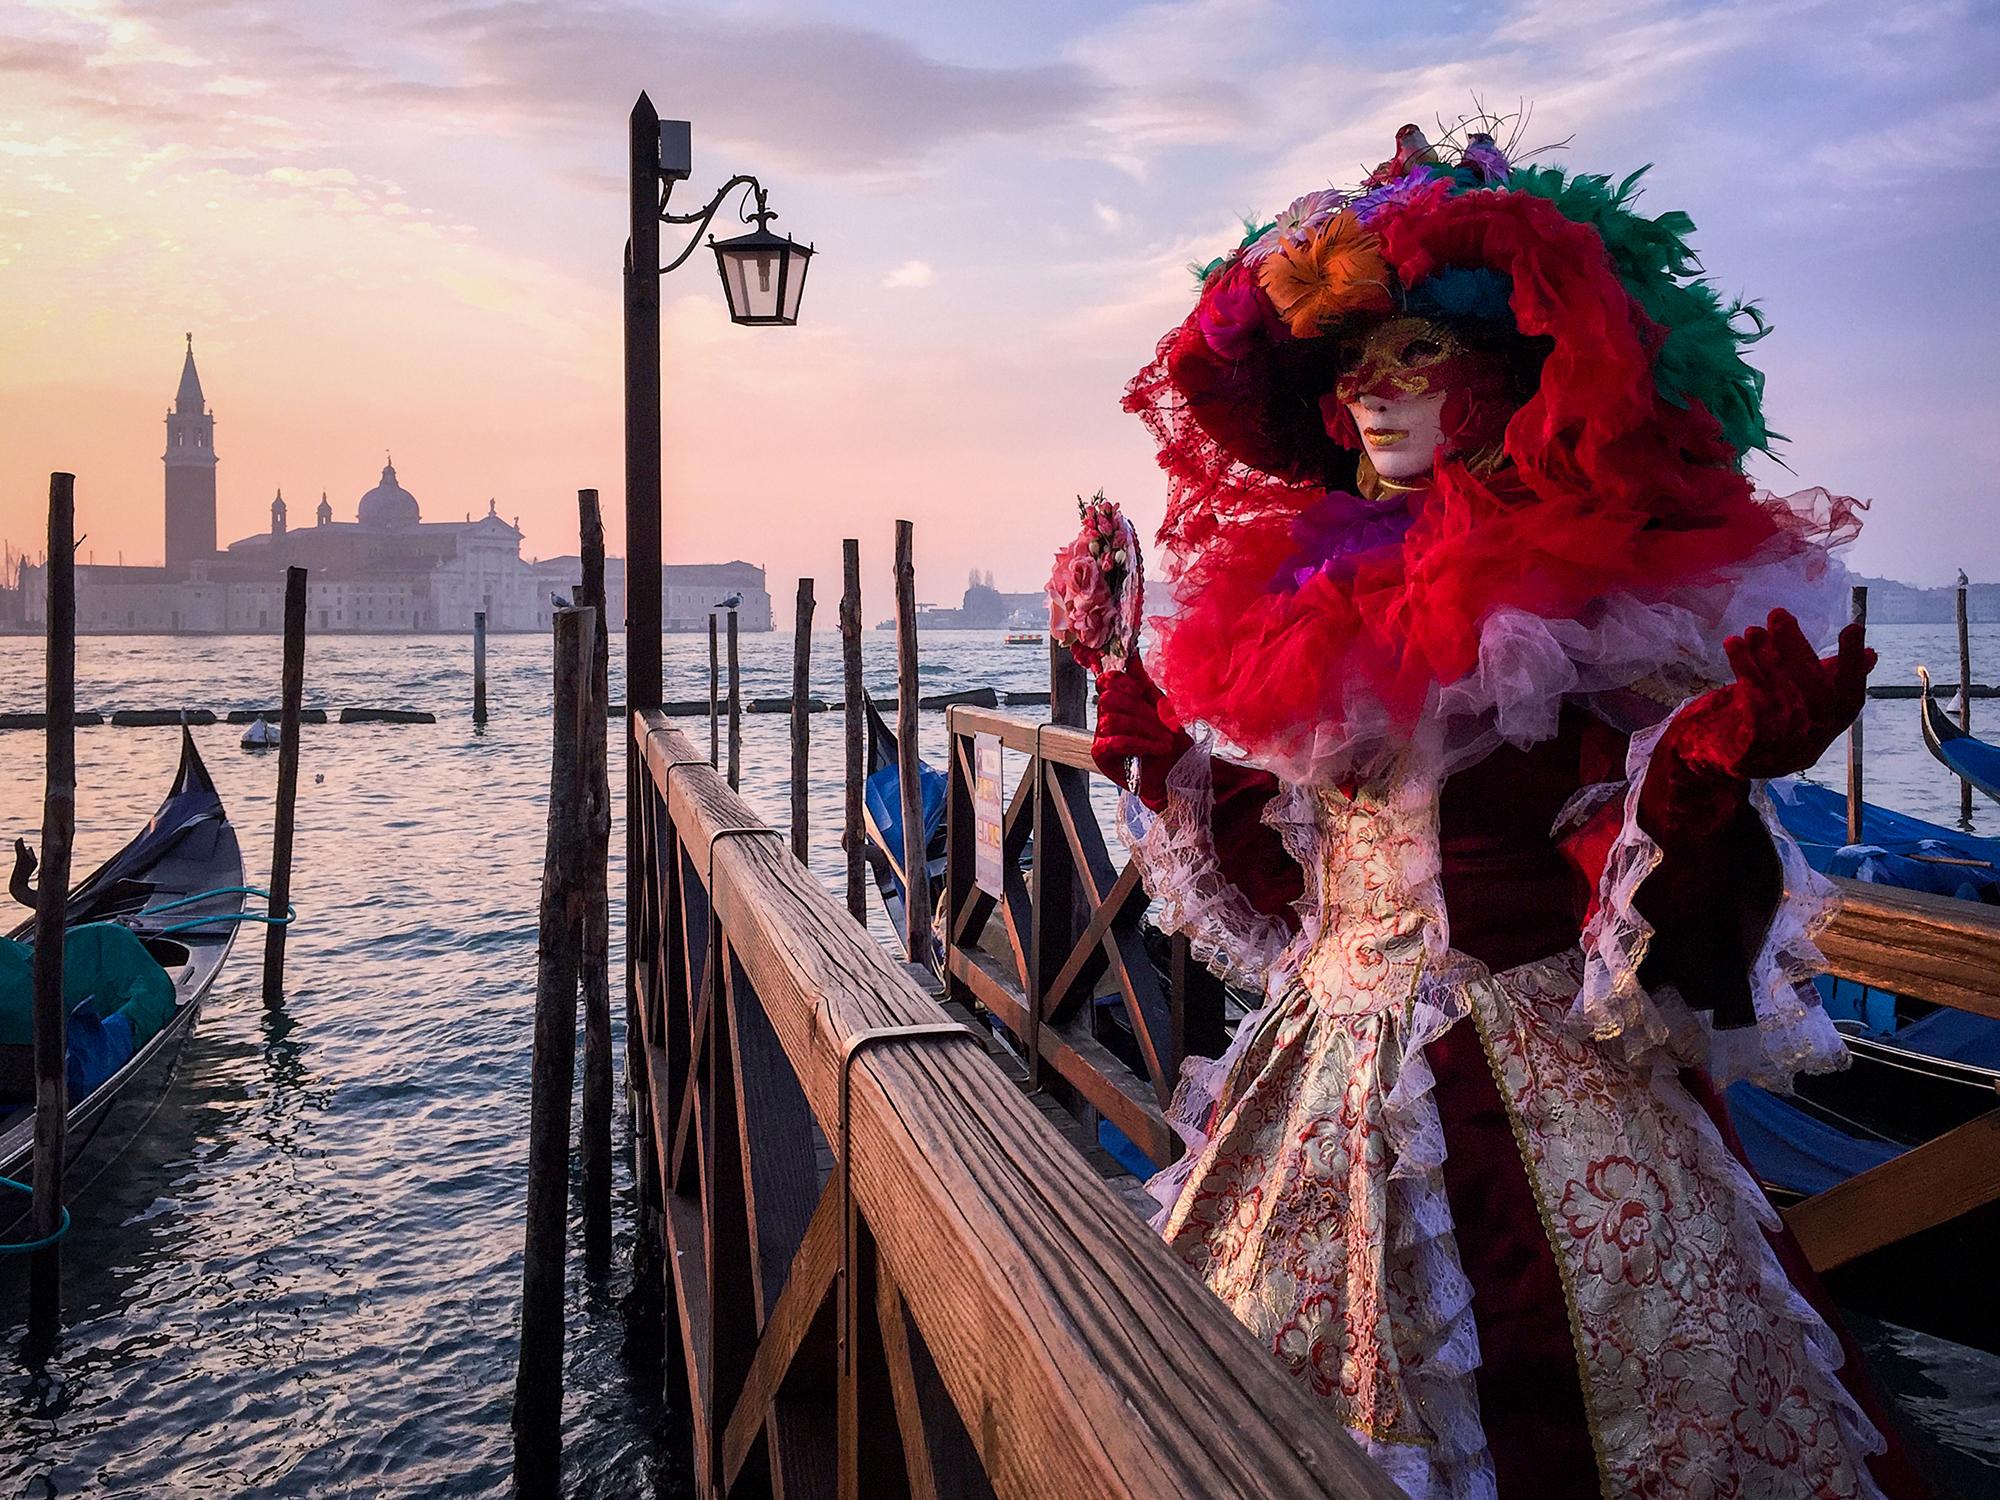 Venice Carnival lady © Adrian McGarry 2016